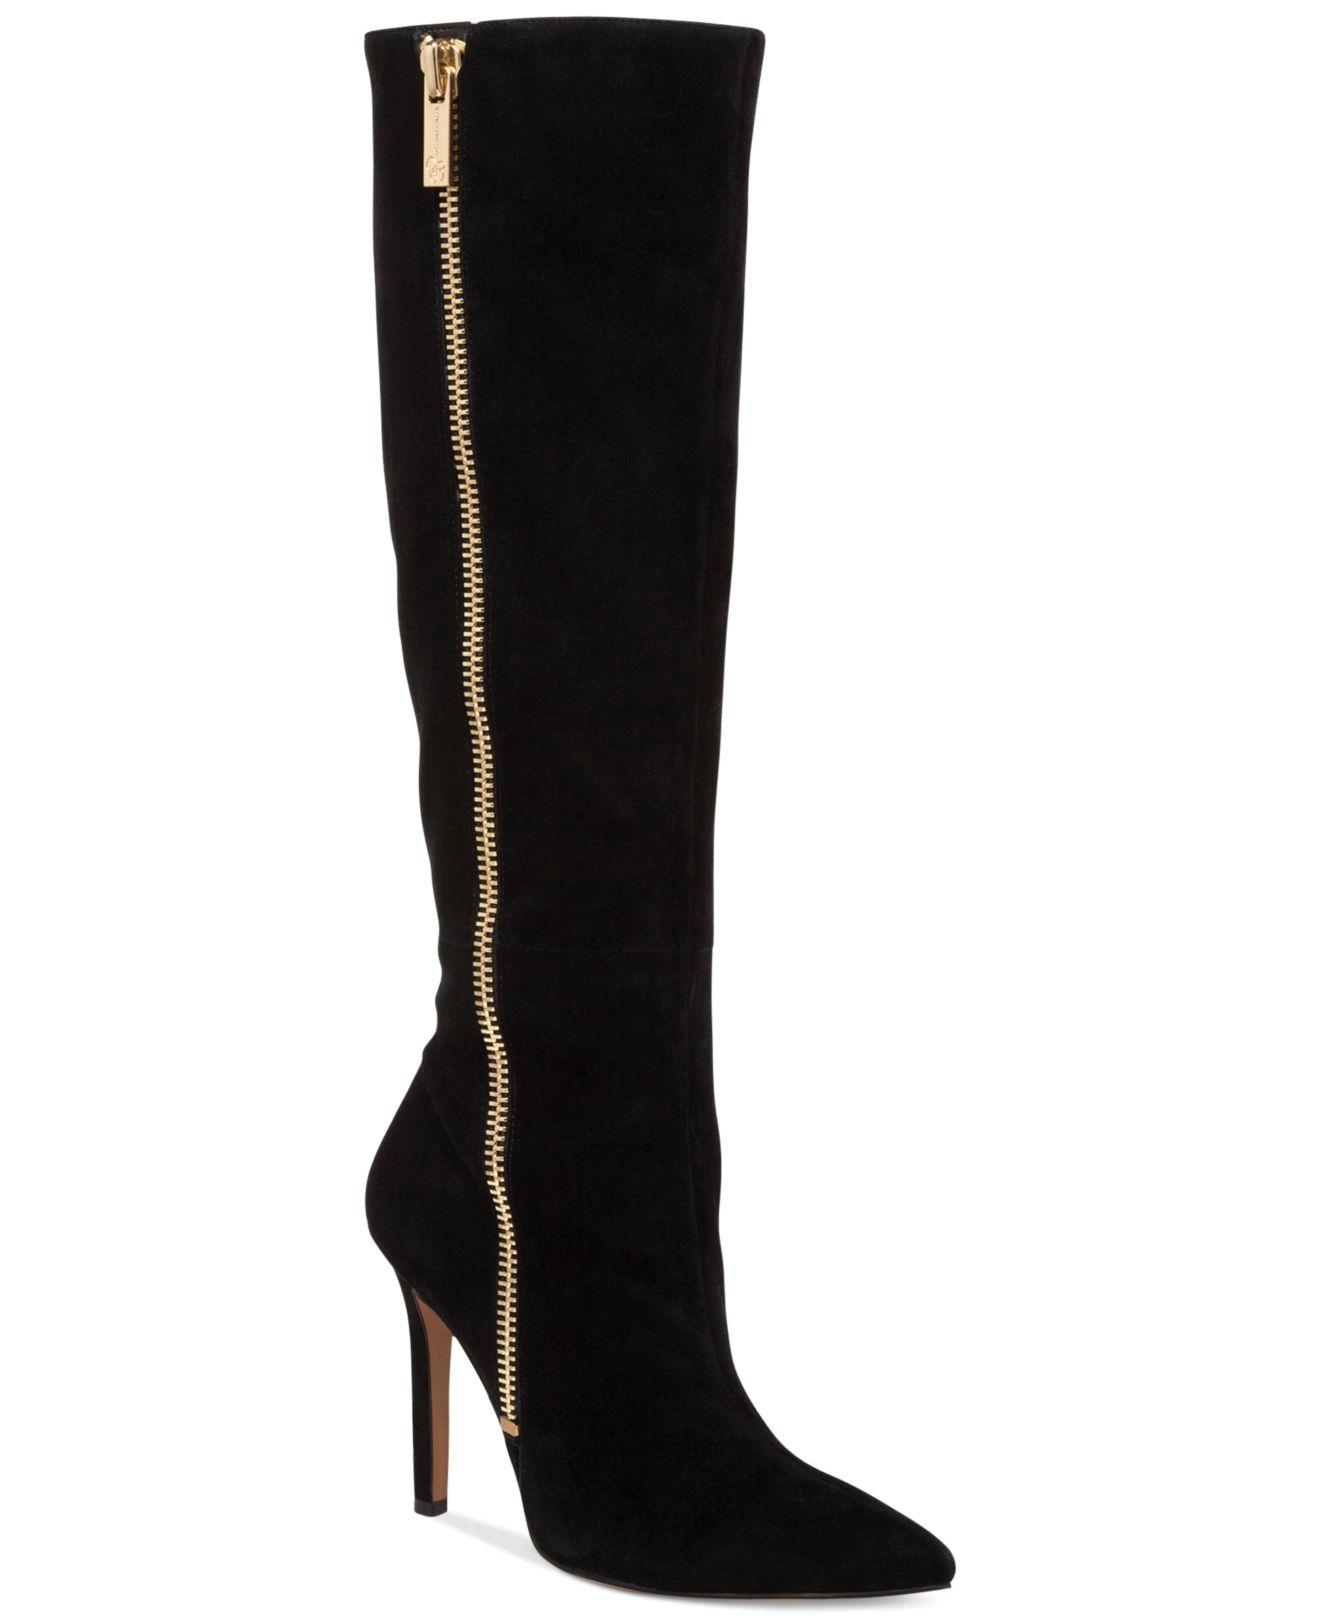 d66cd1aa7ee Lyst - Jessica Simpson Capitani Dress Boots in Black